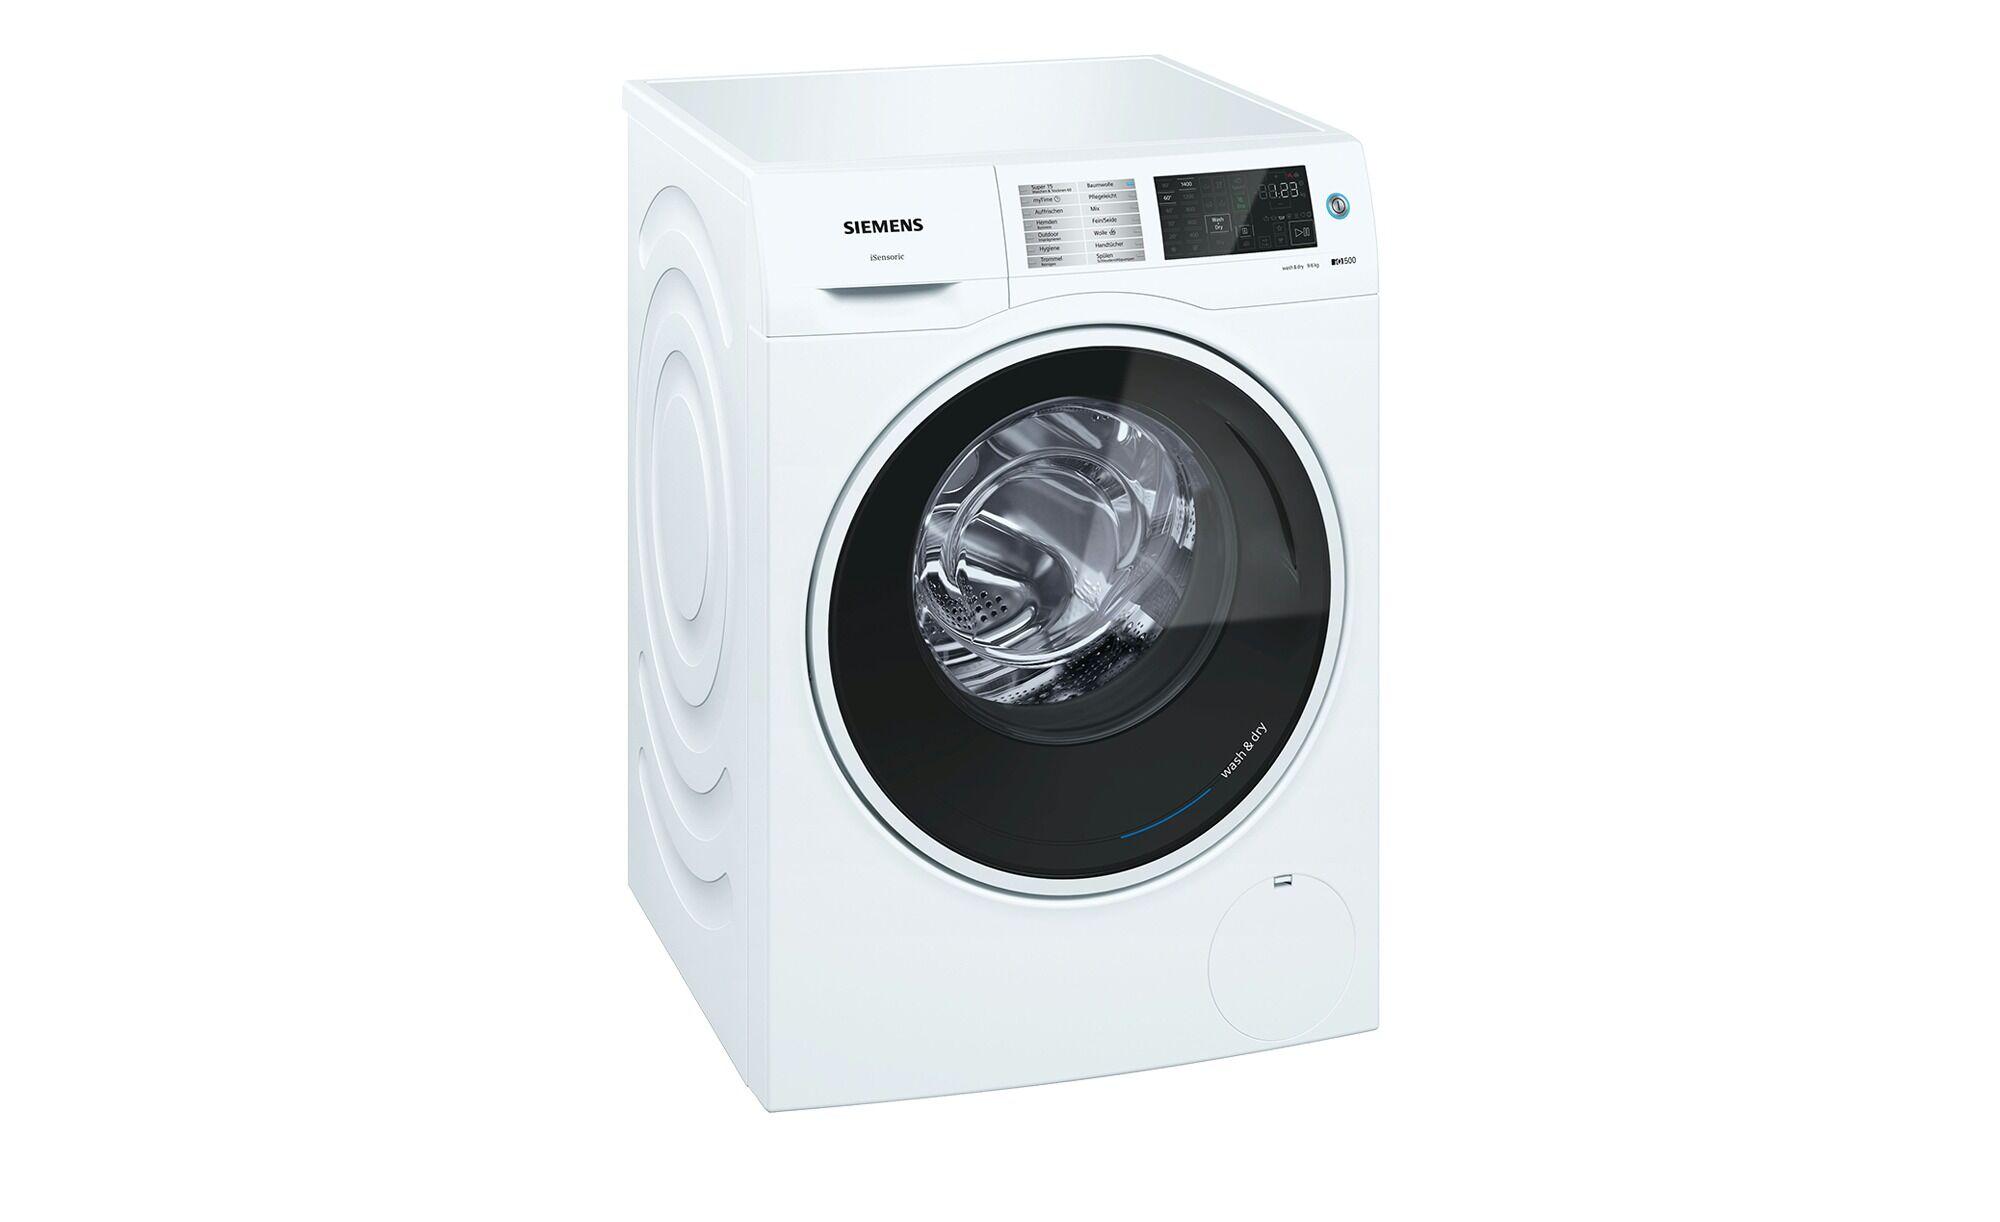 Siemens Waschtrockner  WD14U540 ¦ weiß ¦ Kunststoff, Metall-lackiert